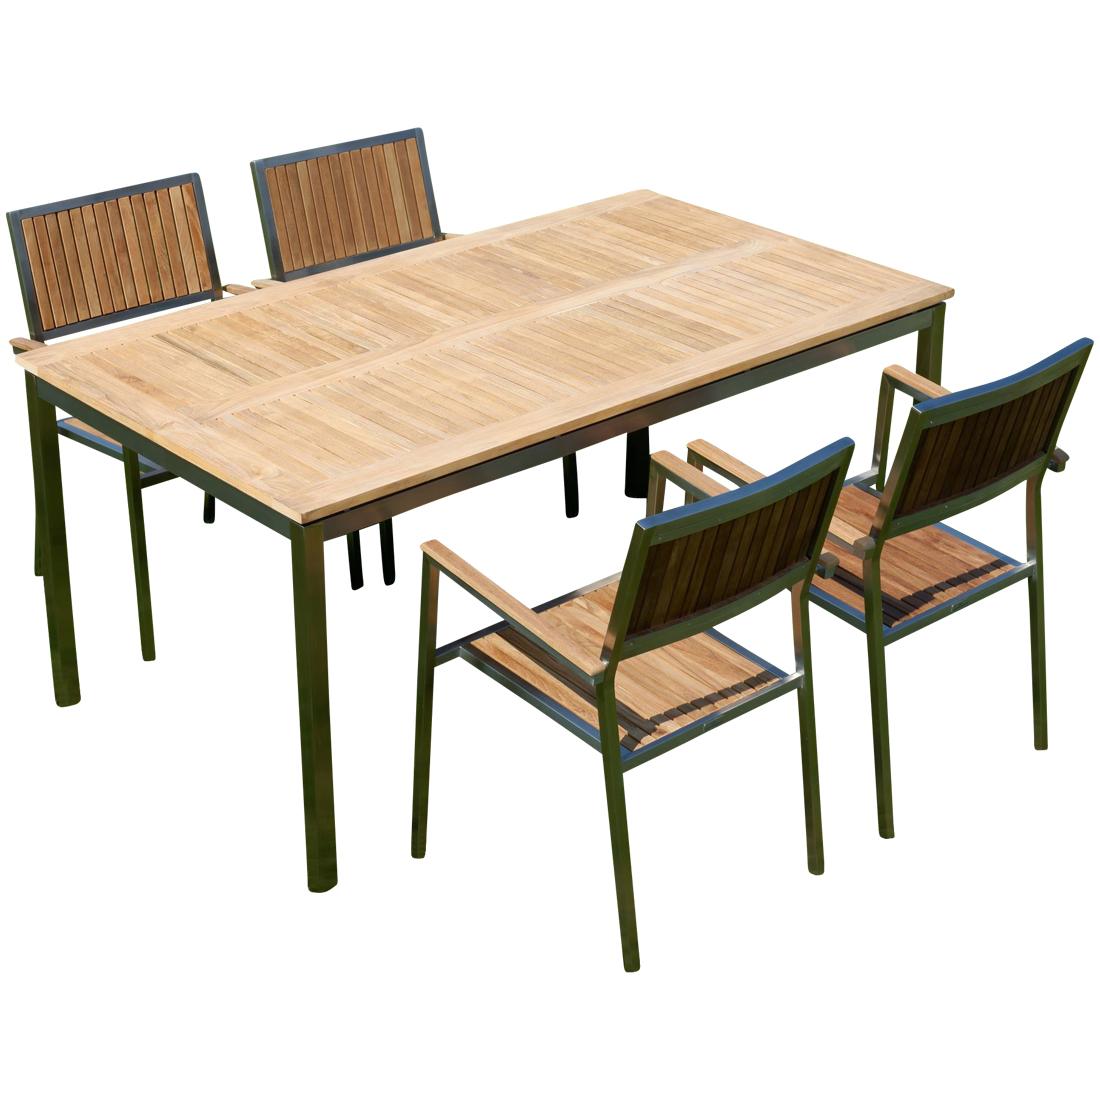 Designer Gartenstuhl mit Armlehne KUBA-TEAK Gartensessel Stapelstuhl Stapelsessel Sessel Edelstahl Teak A-Grade stapelbar sehr robust